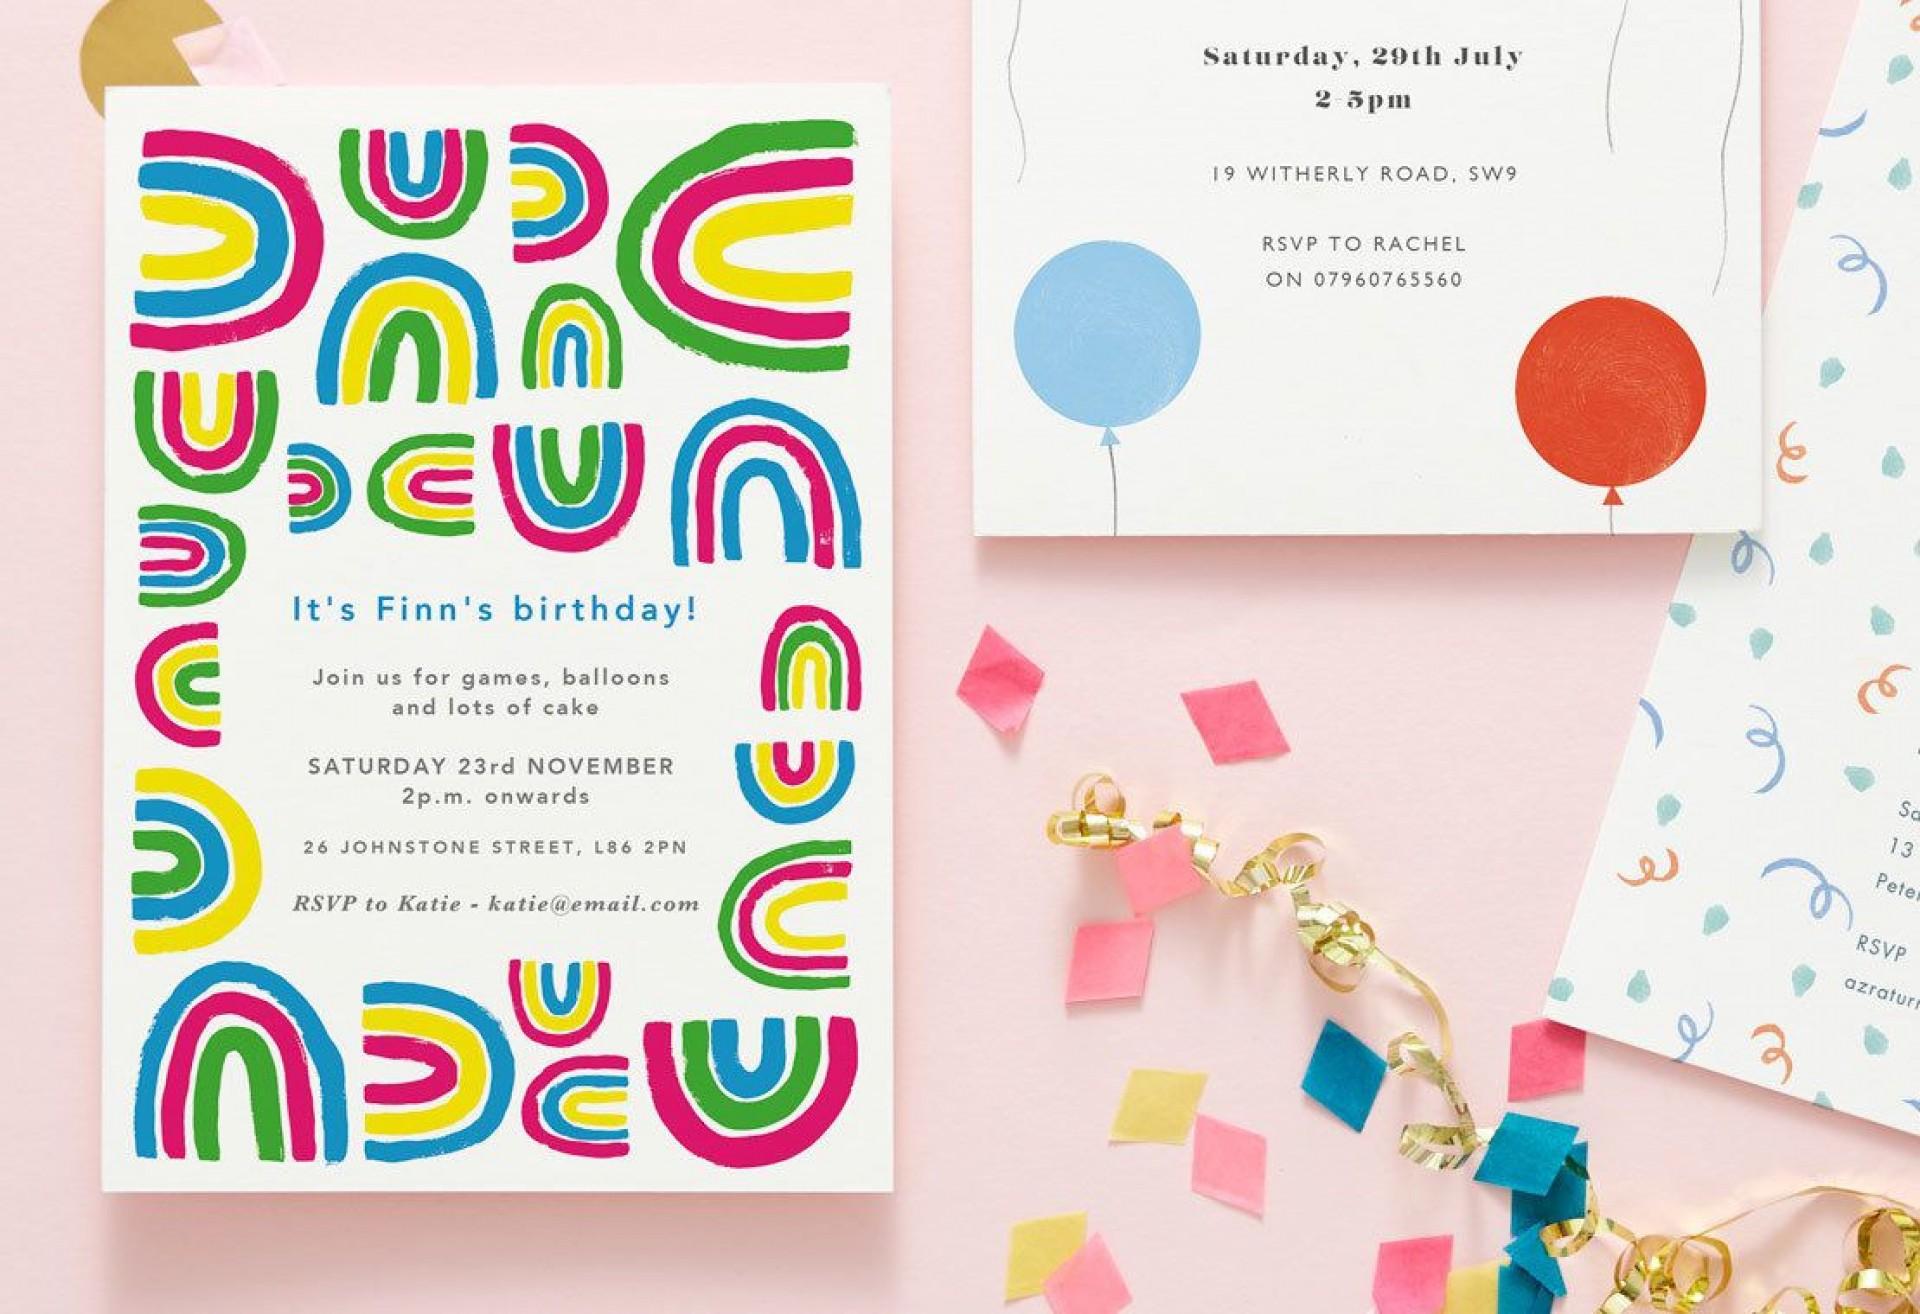 002 Fantastic Birthday Invitation Wording Example High Def  Examples Party Invite Brunch Idea1920